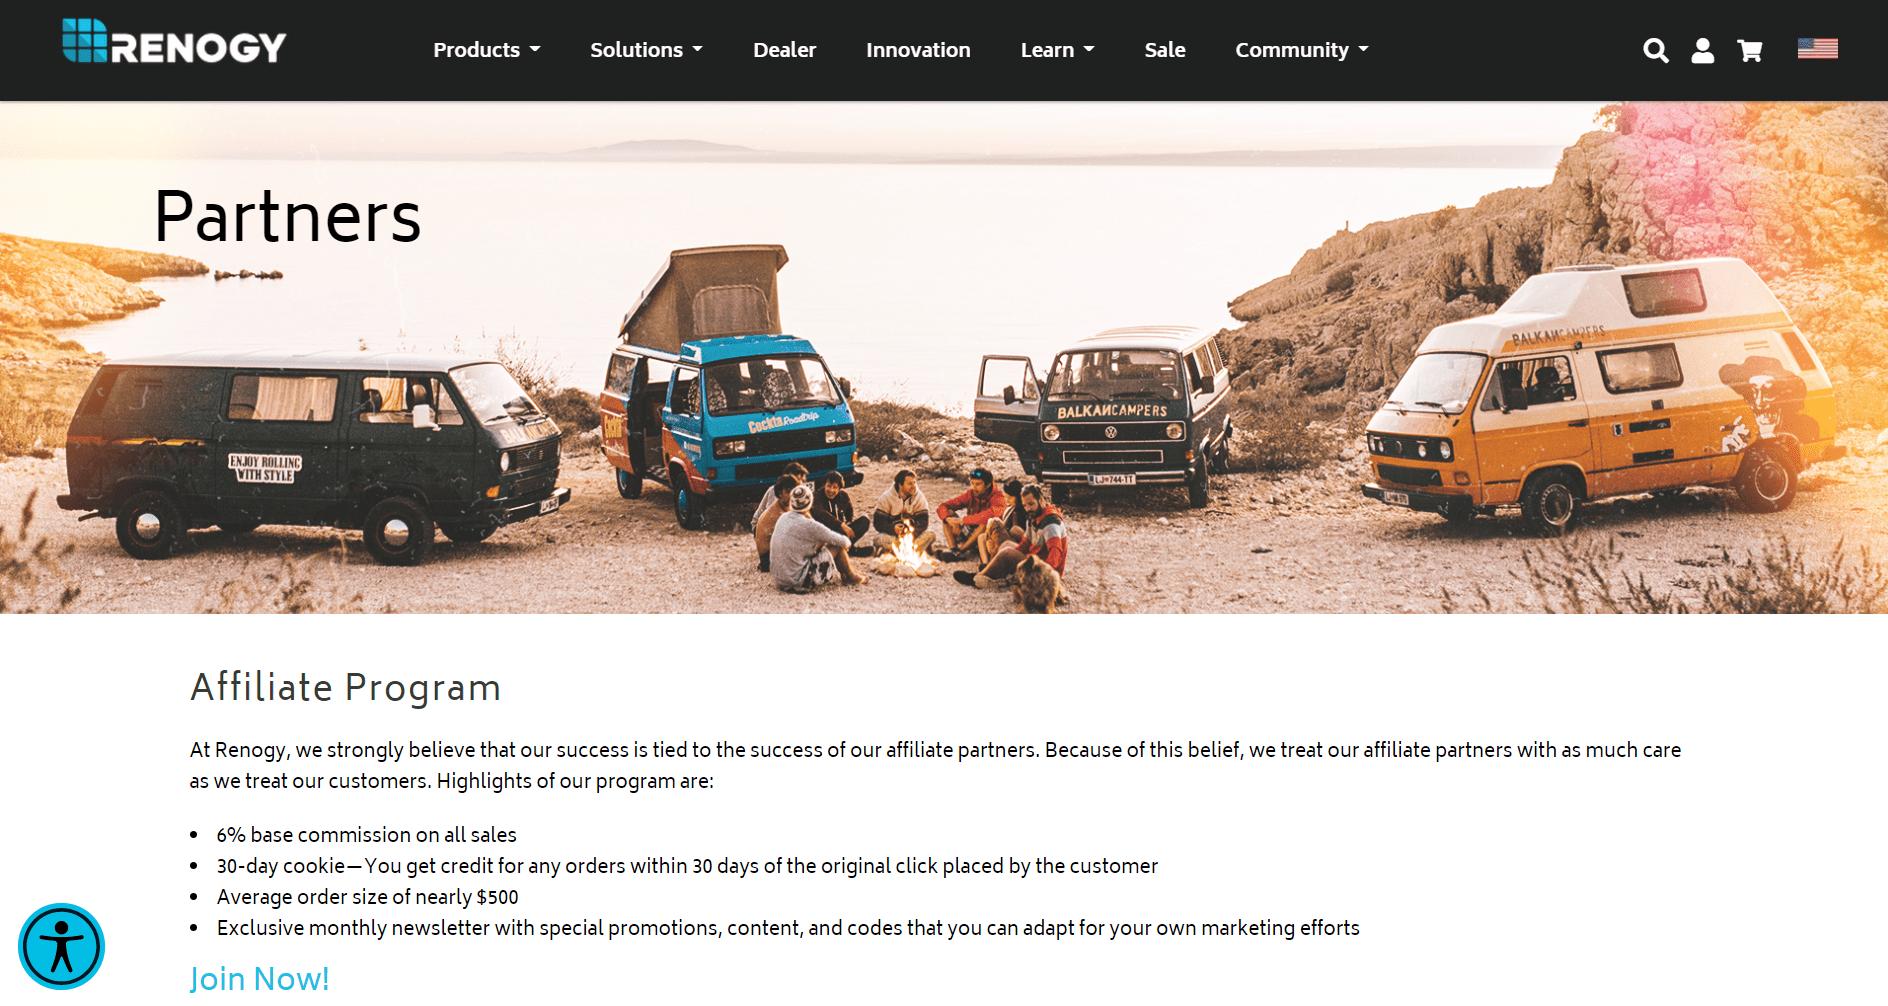 Renogy's homepage